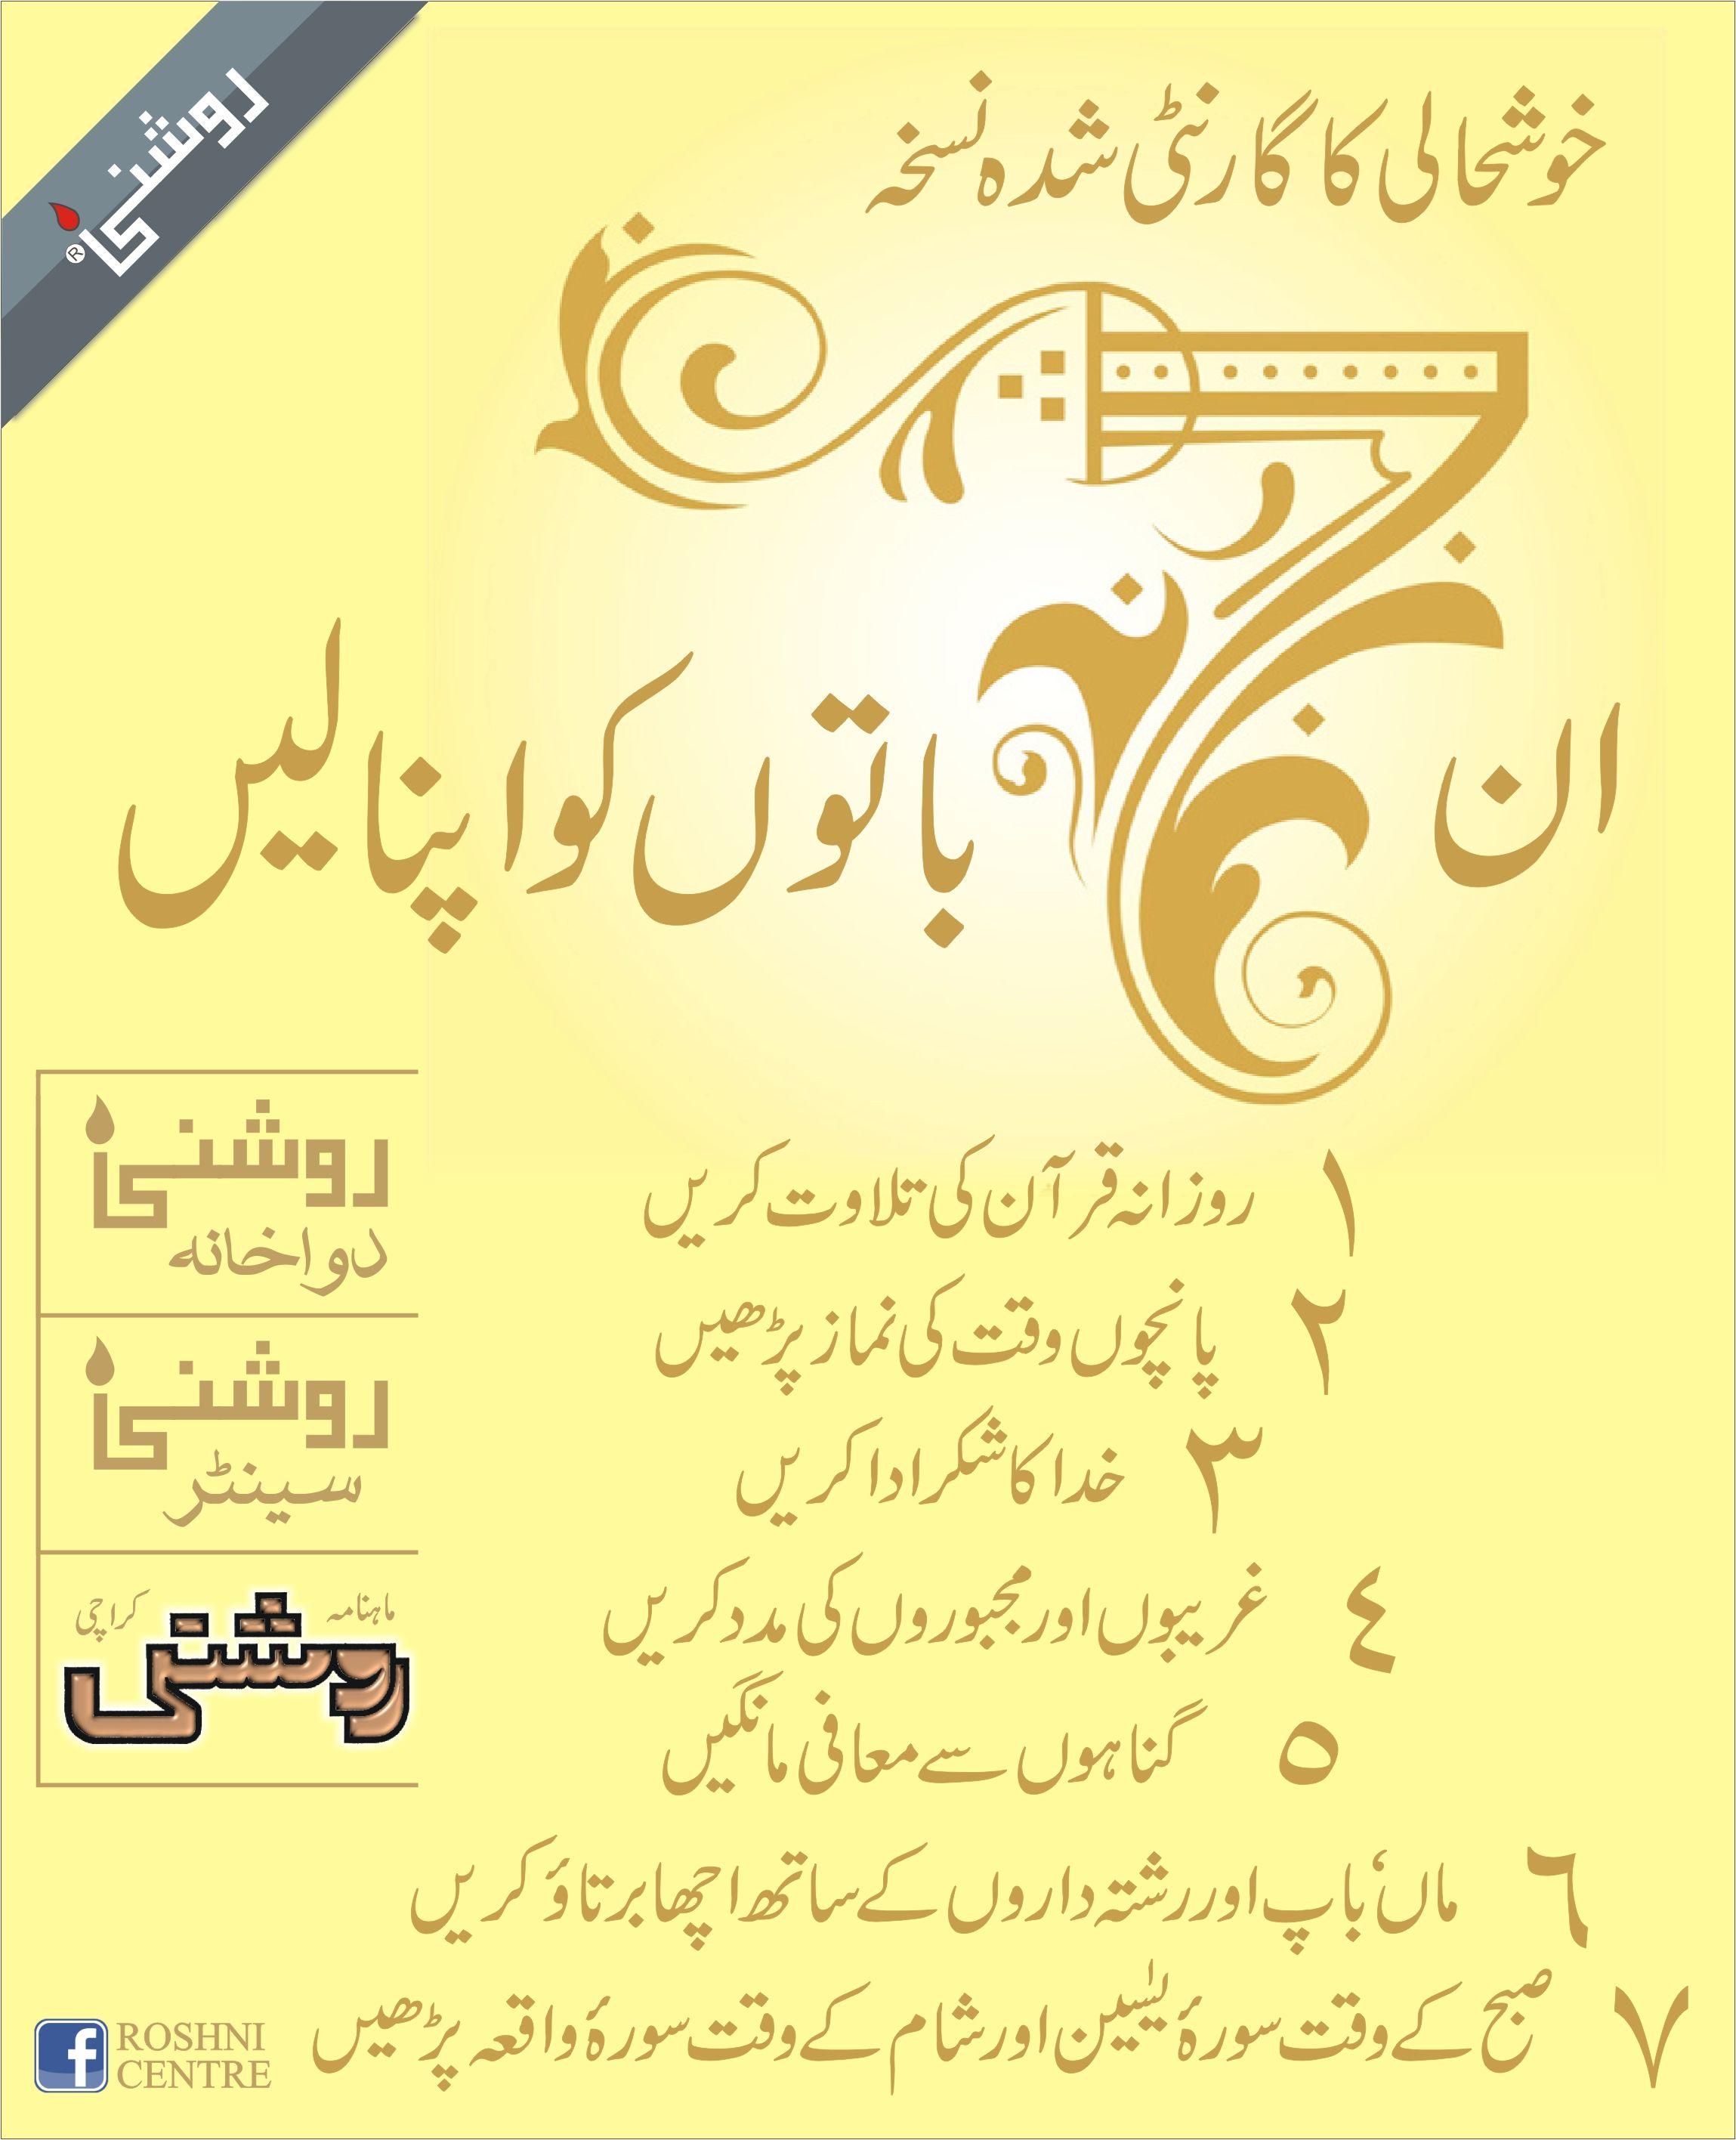 Pin von Shabnam Shabo auf Islam | Think